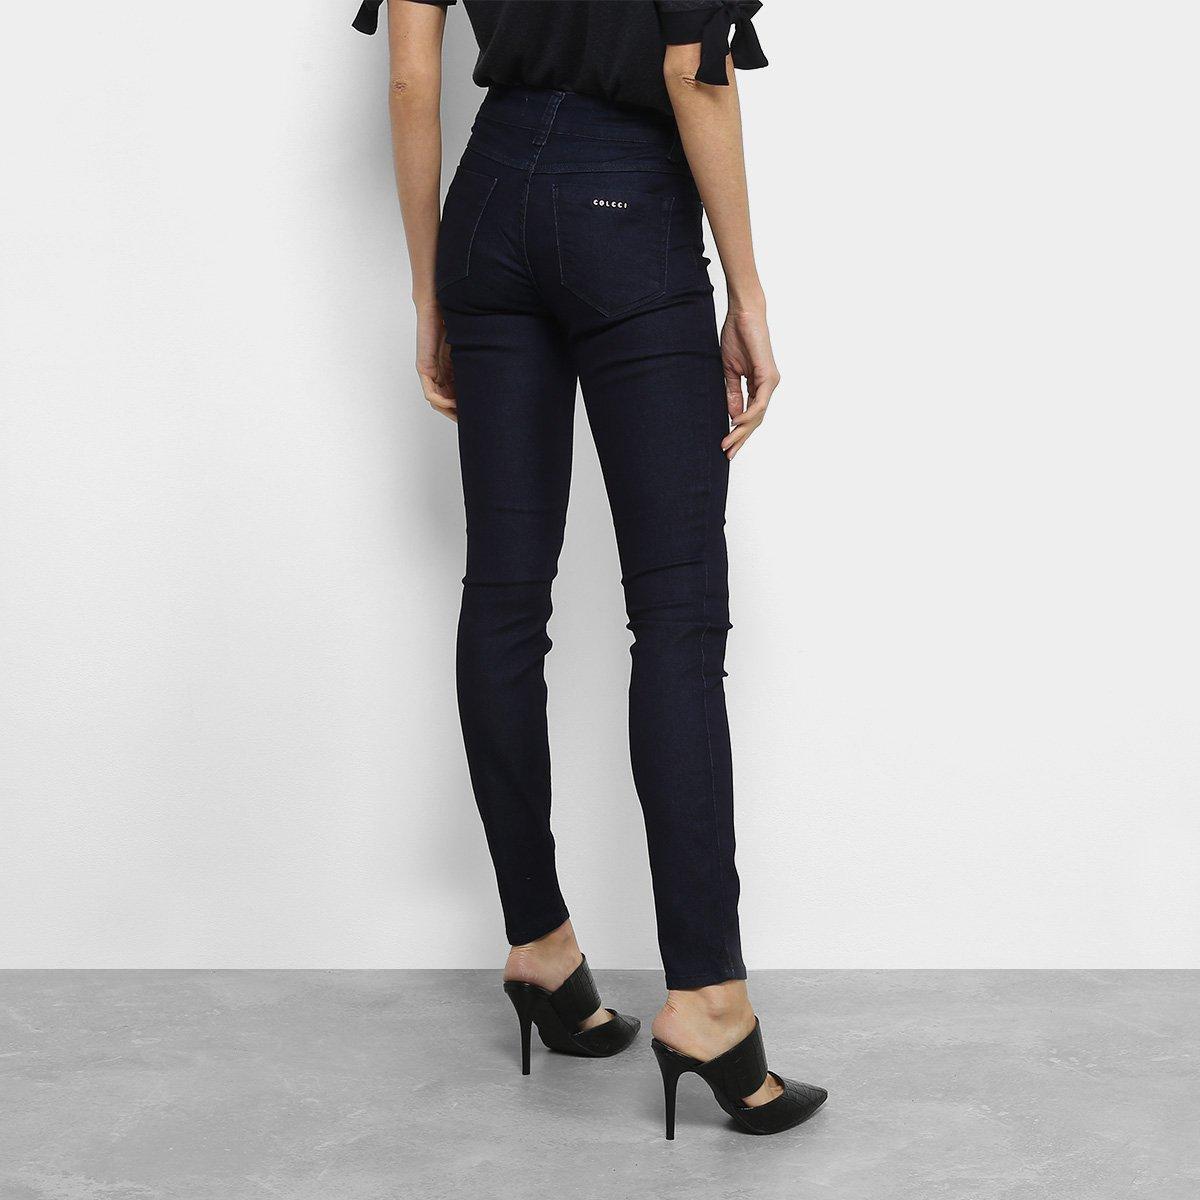 6dbb61aaa Calça Jeans Skinny Colcci Fátima Cintura Alta Feminina | Livelo -Sua ...